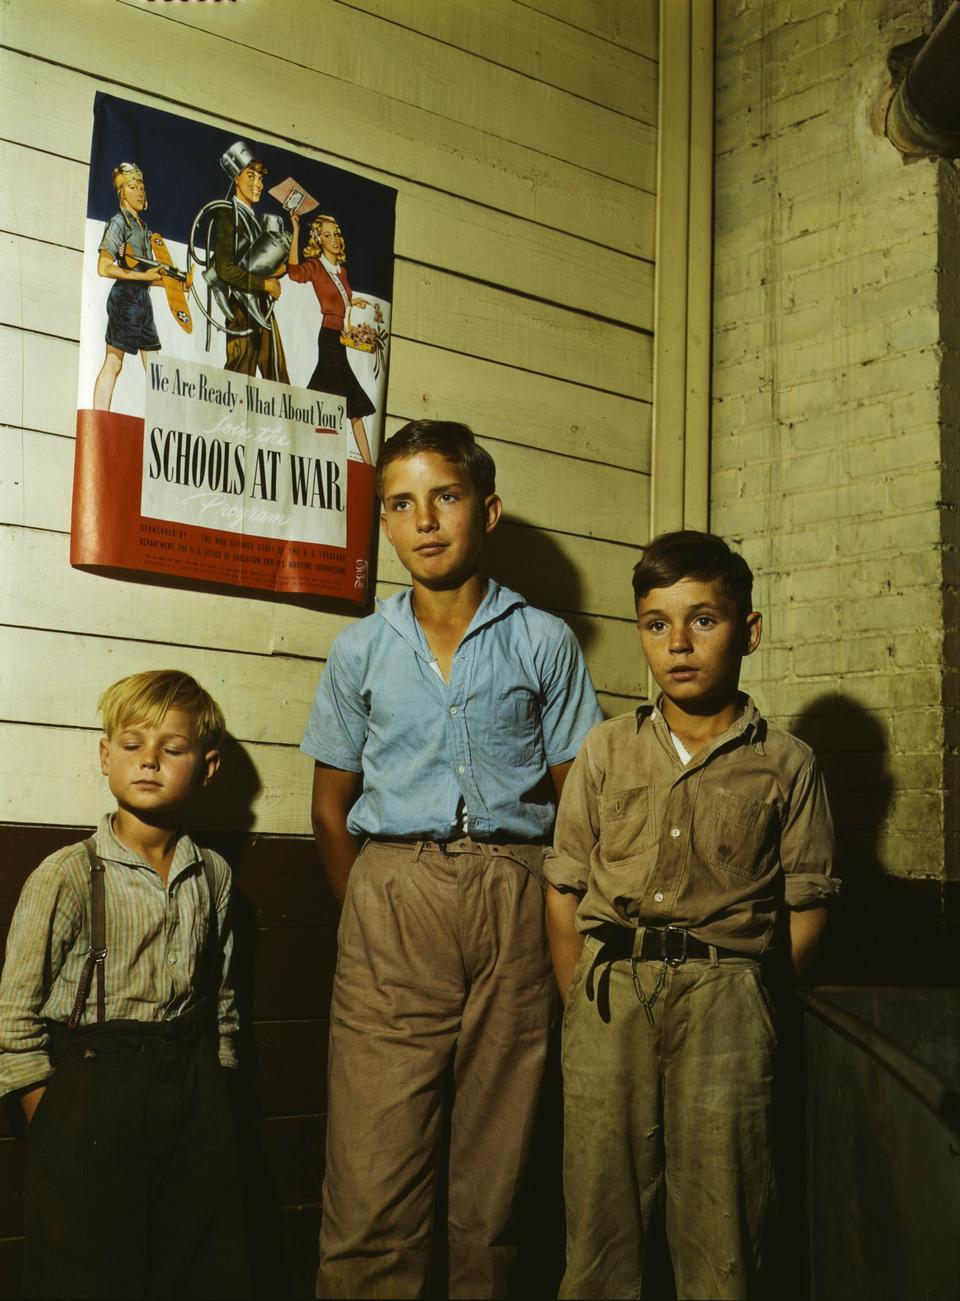 Rural school children